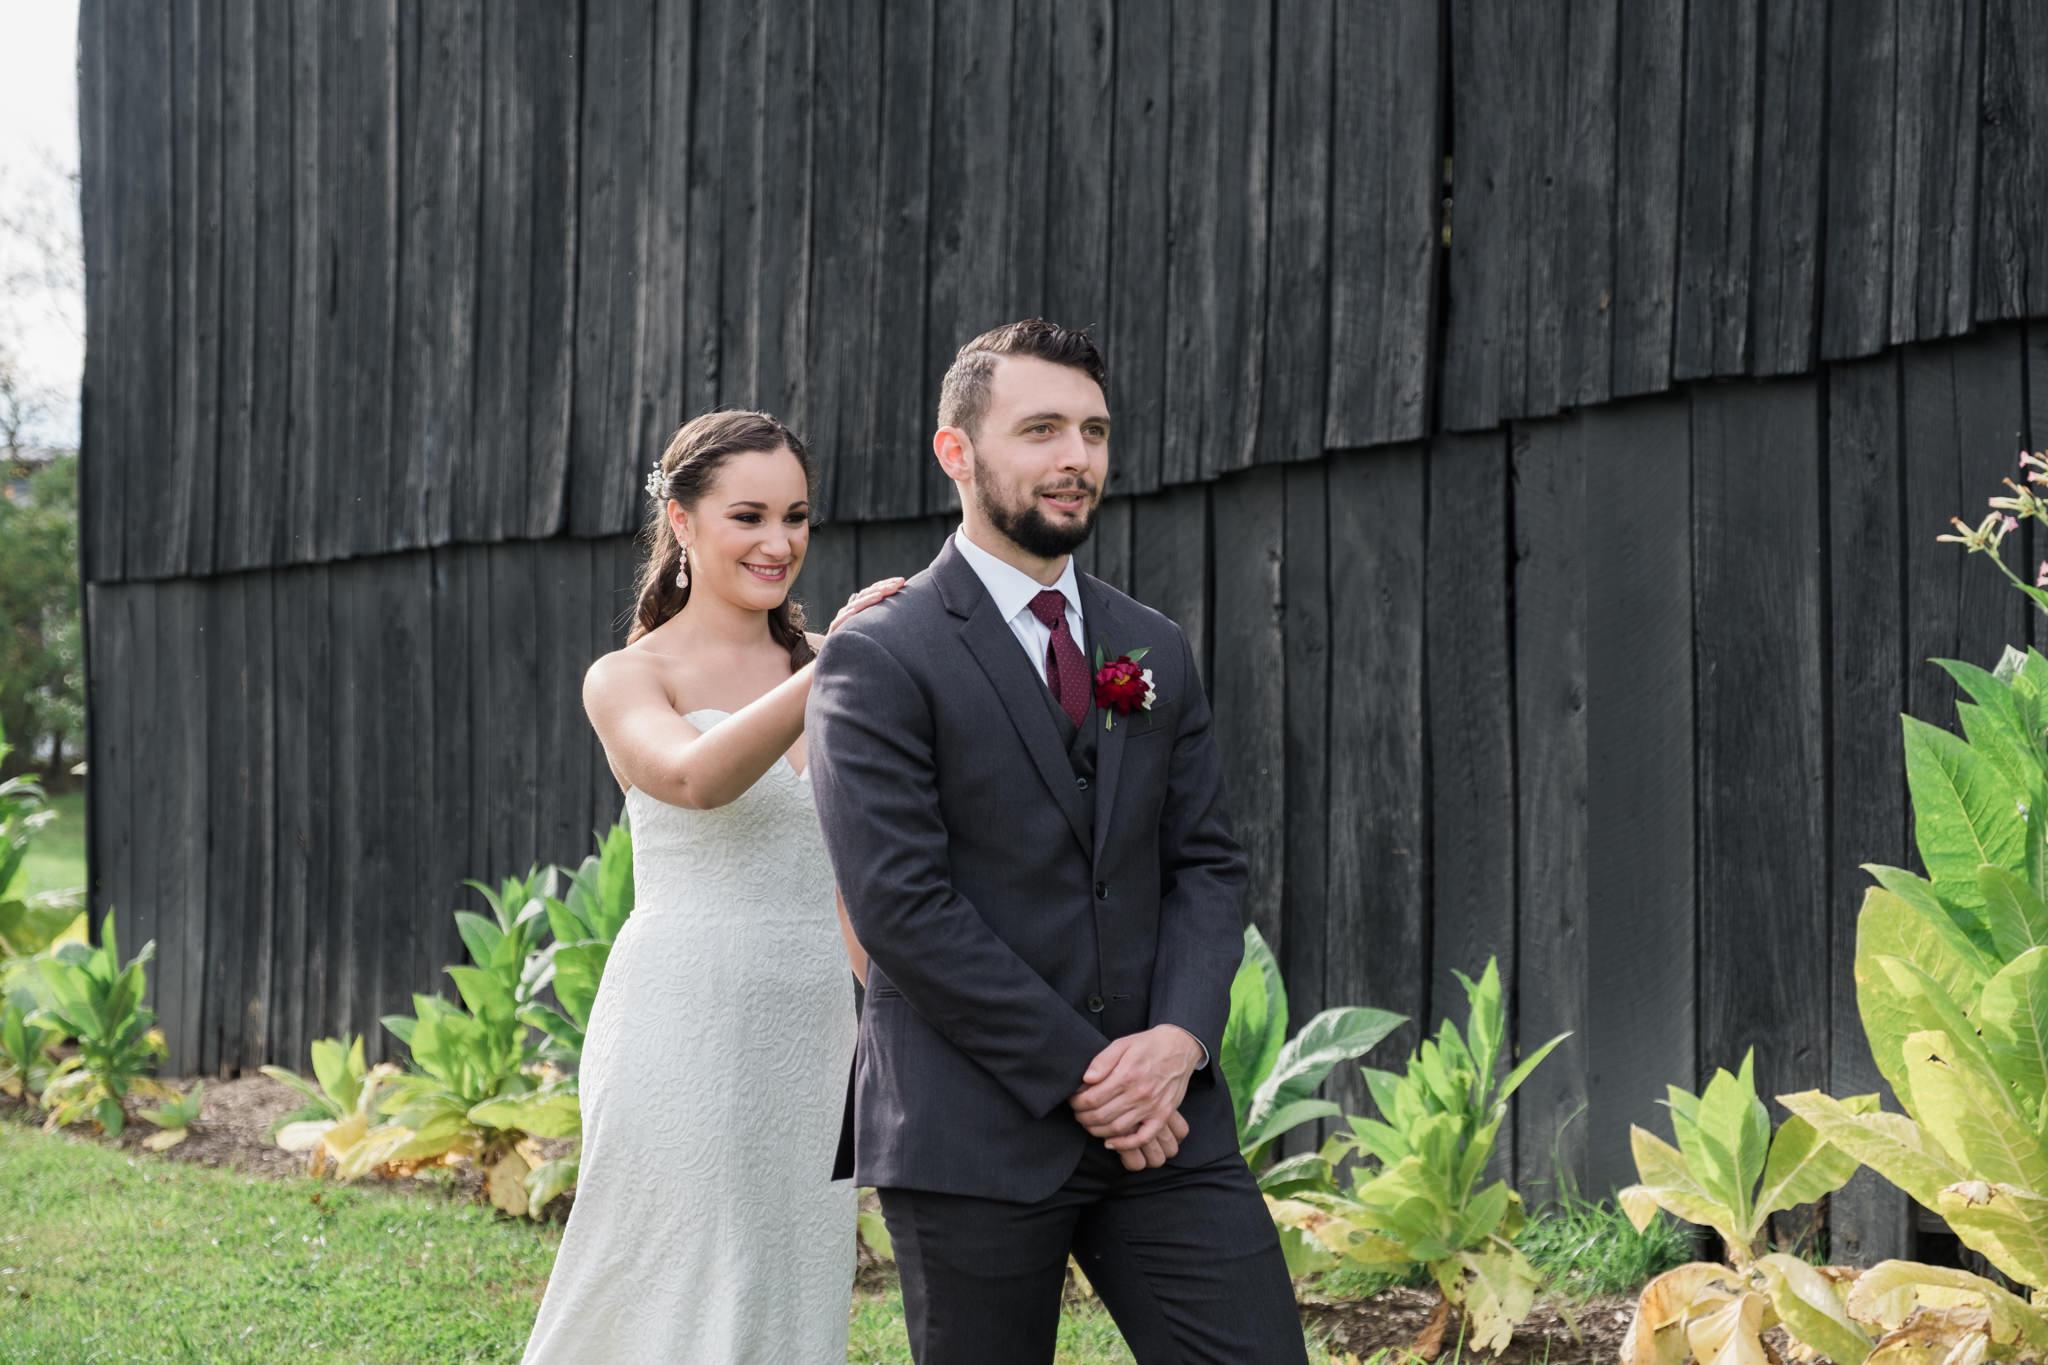 Jordan&Zack_Wedding_Blog_0025.jpg